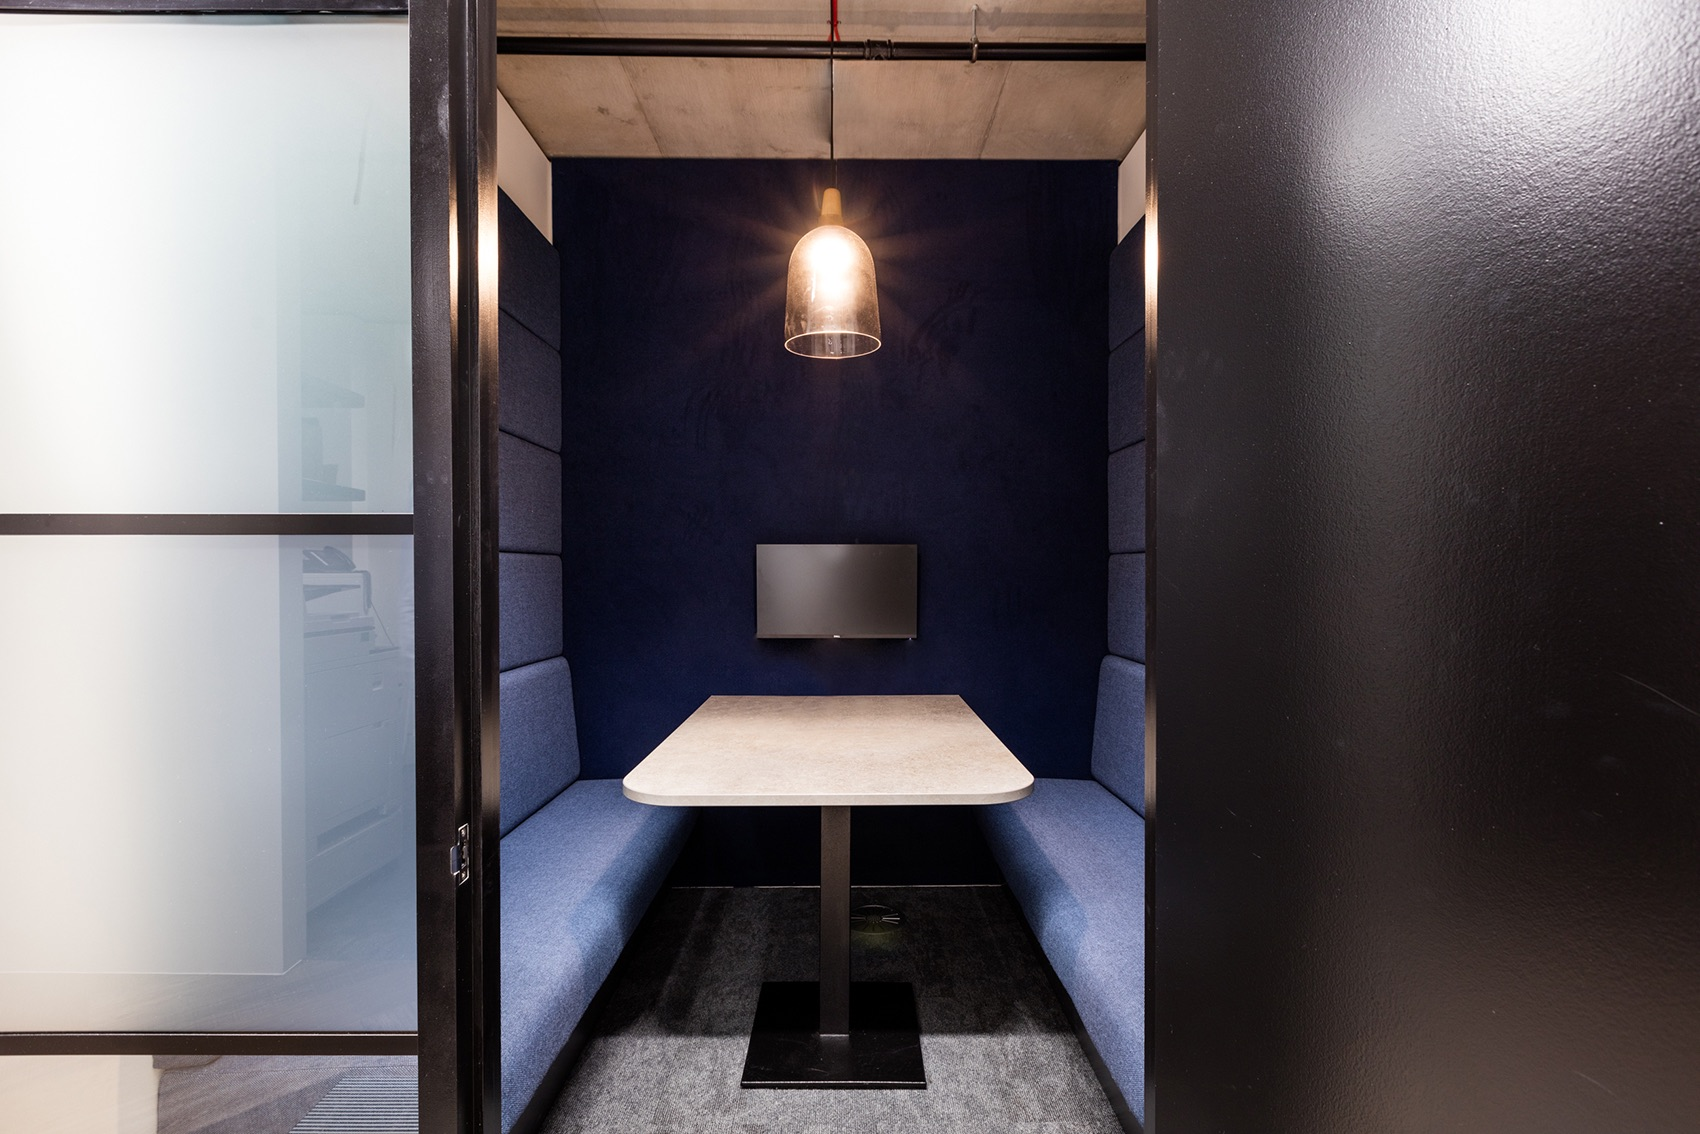 albion-capital-london-office-7